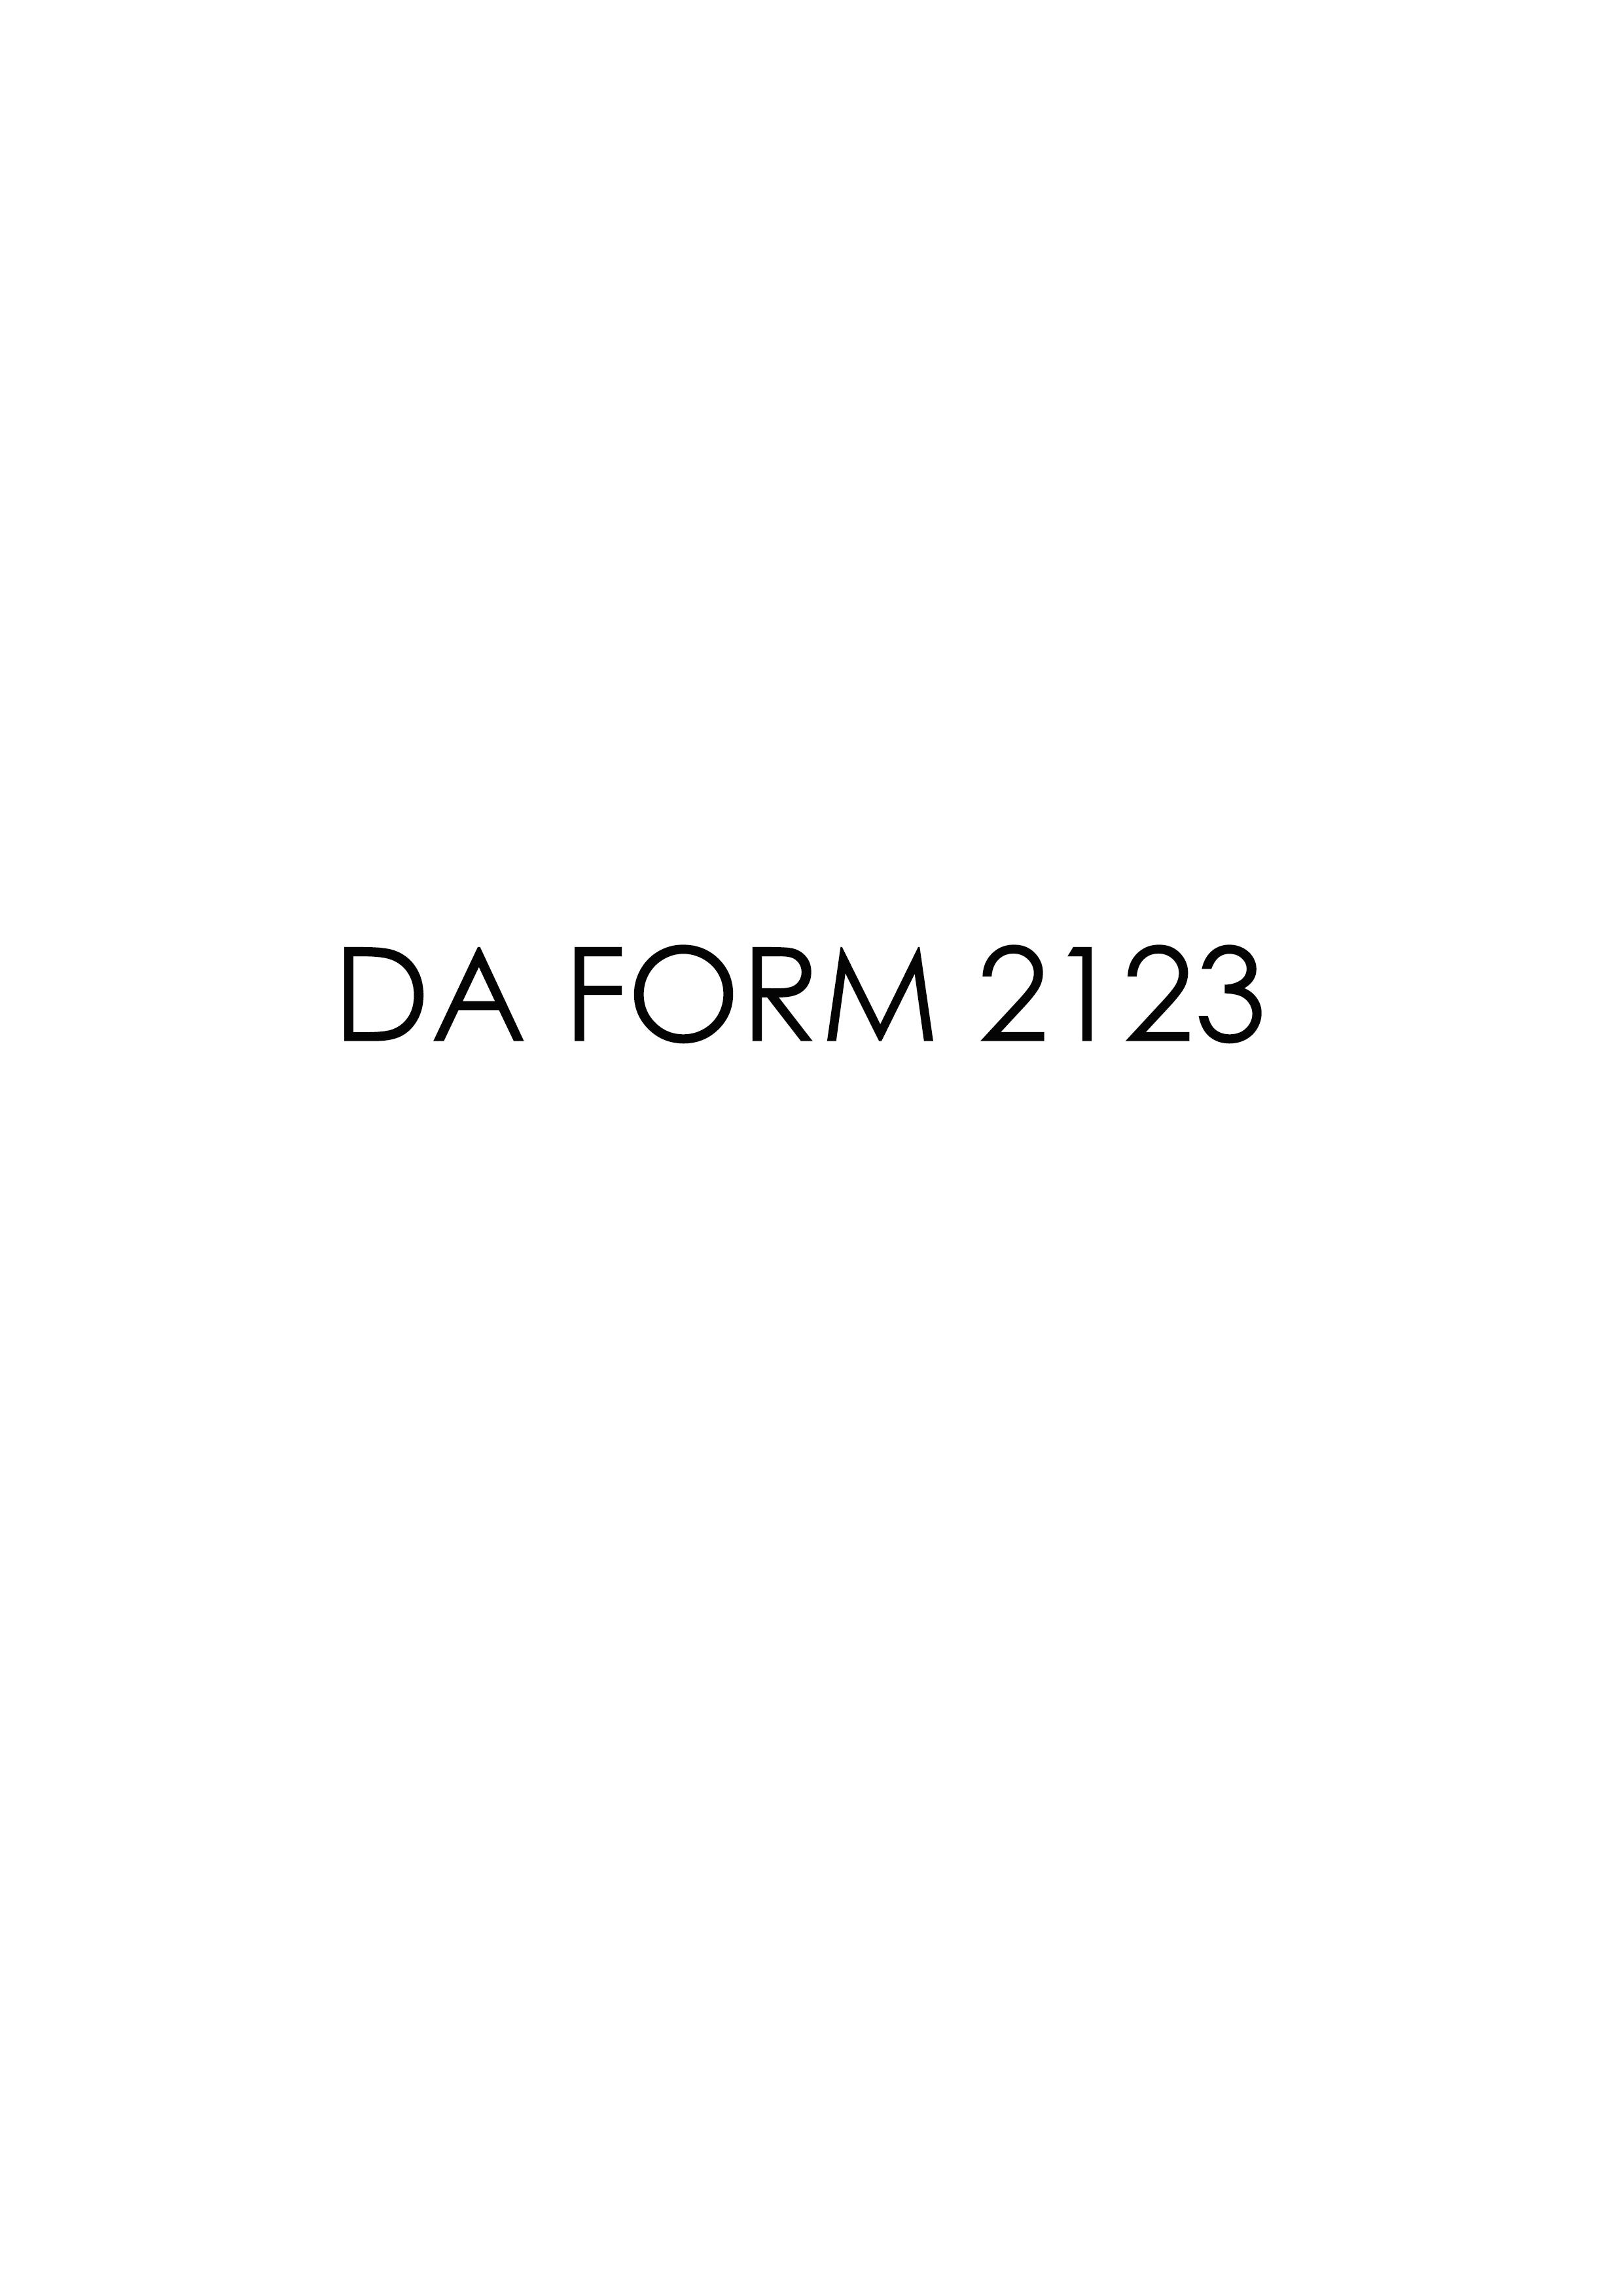 Download da Form 2123 Free